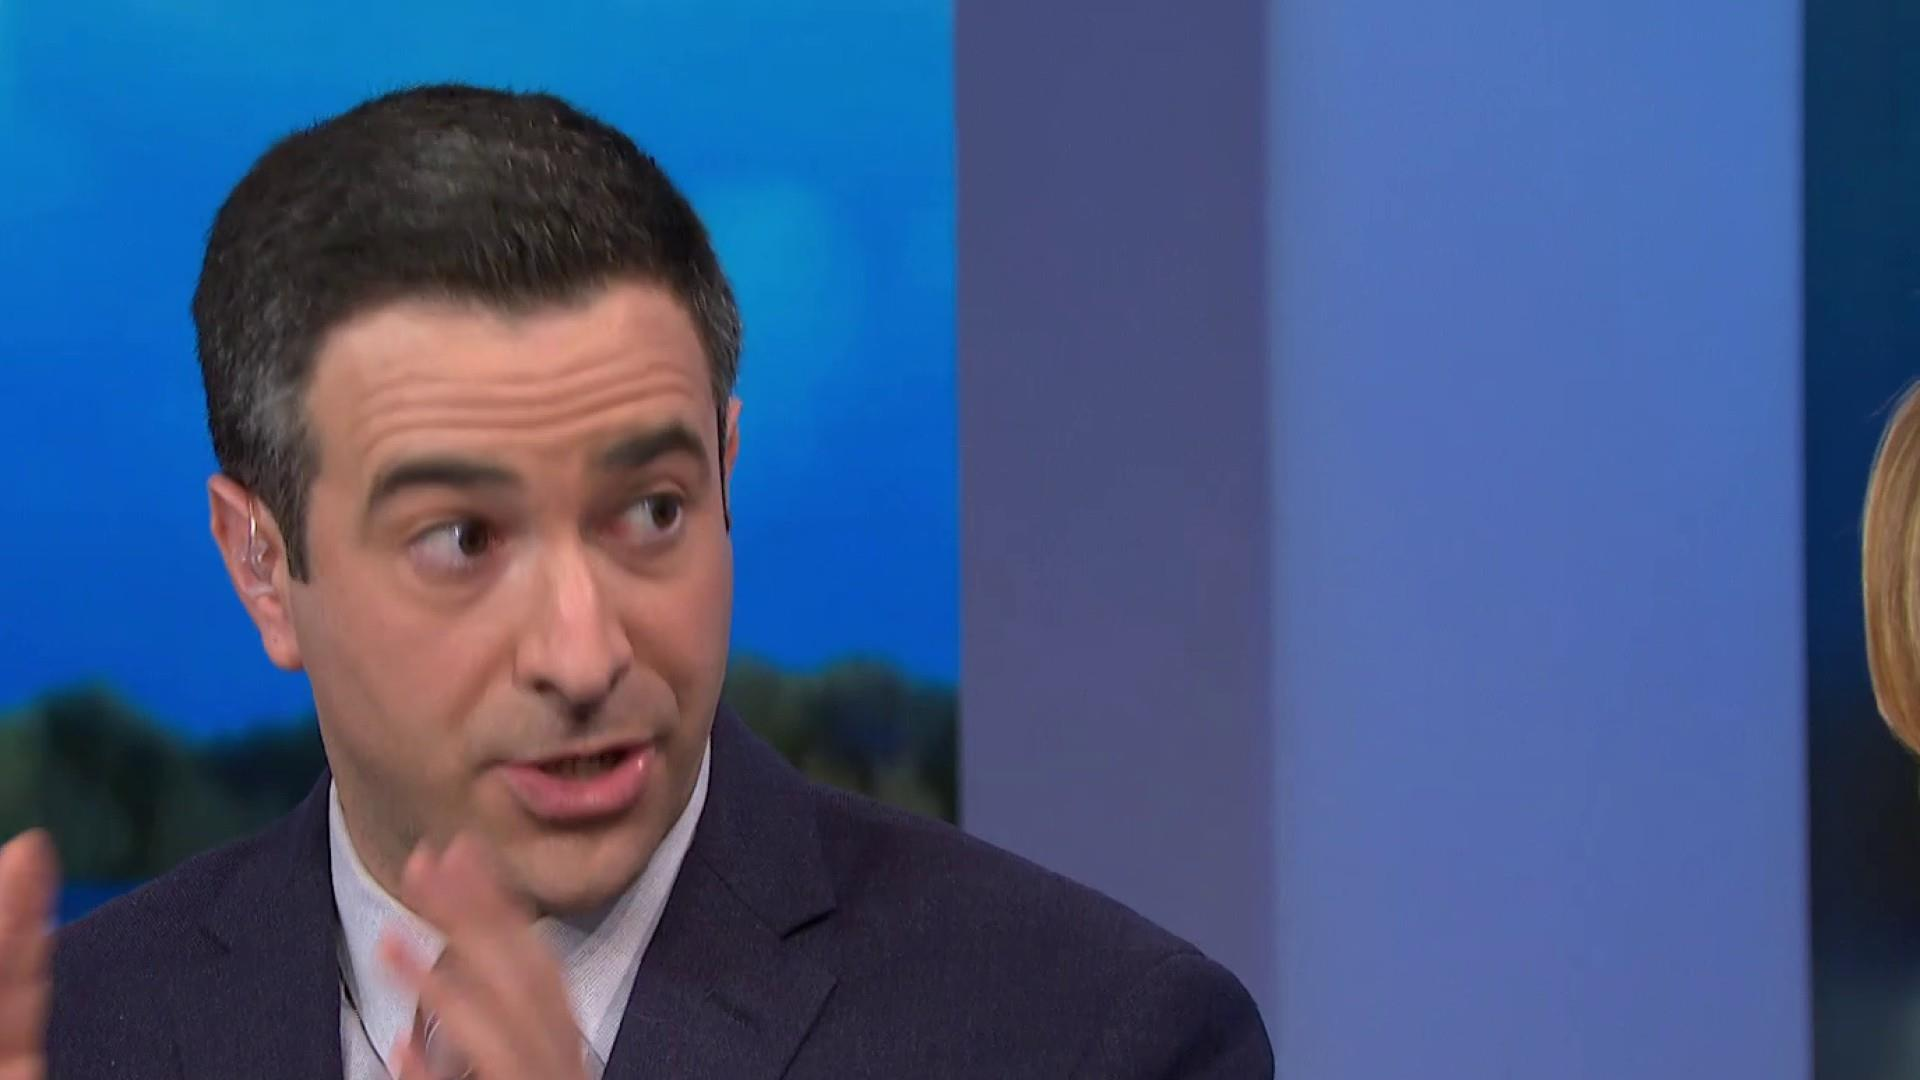 Ari Melber live fact-checks GOP Congressman on 'bribery' during impeachment hearing